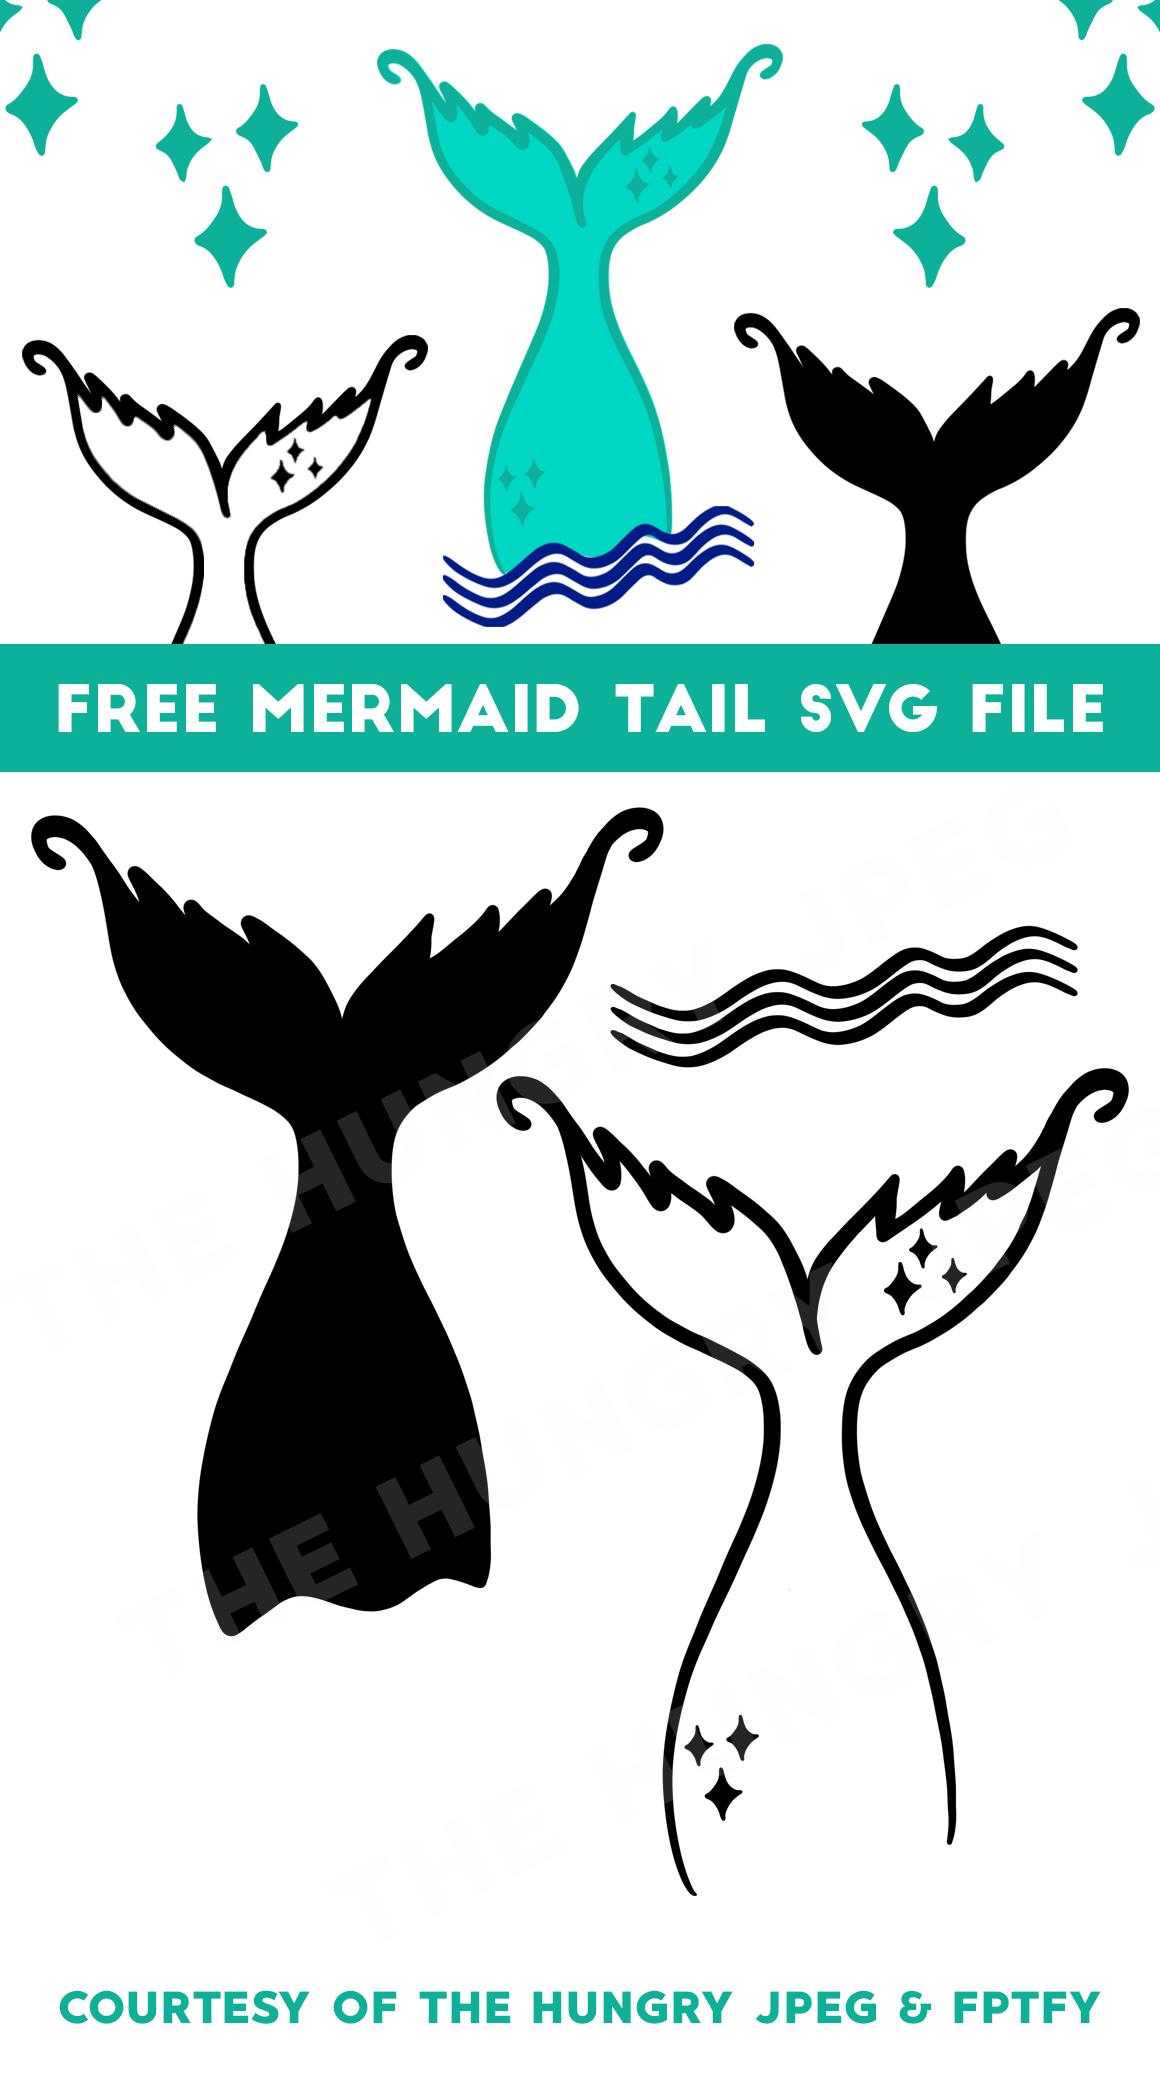 Mermaid Tail Svg Free